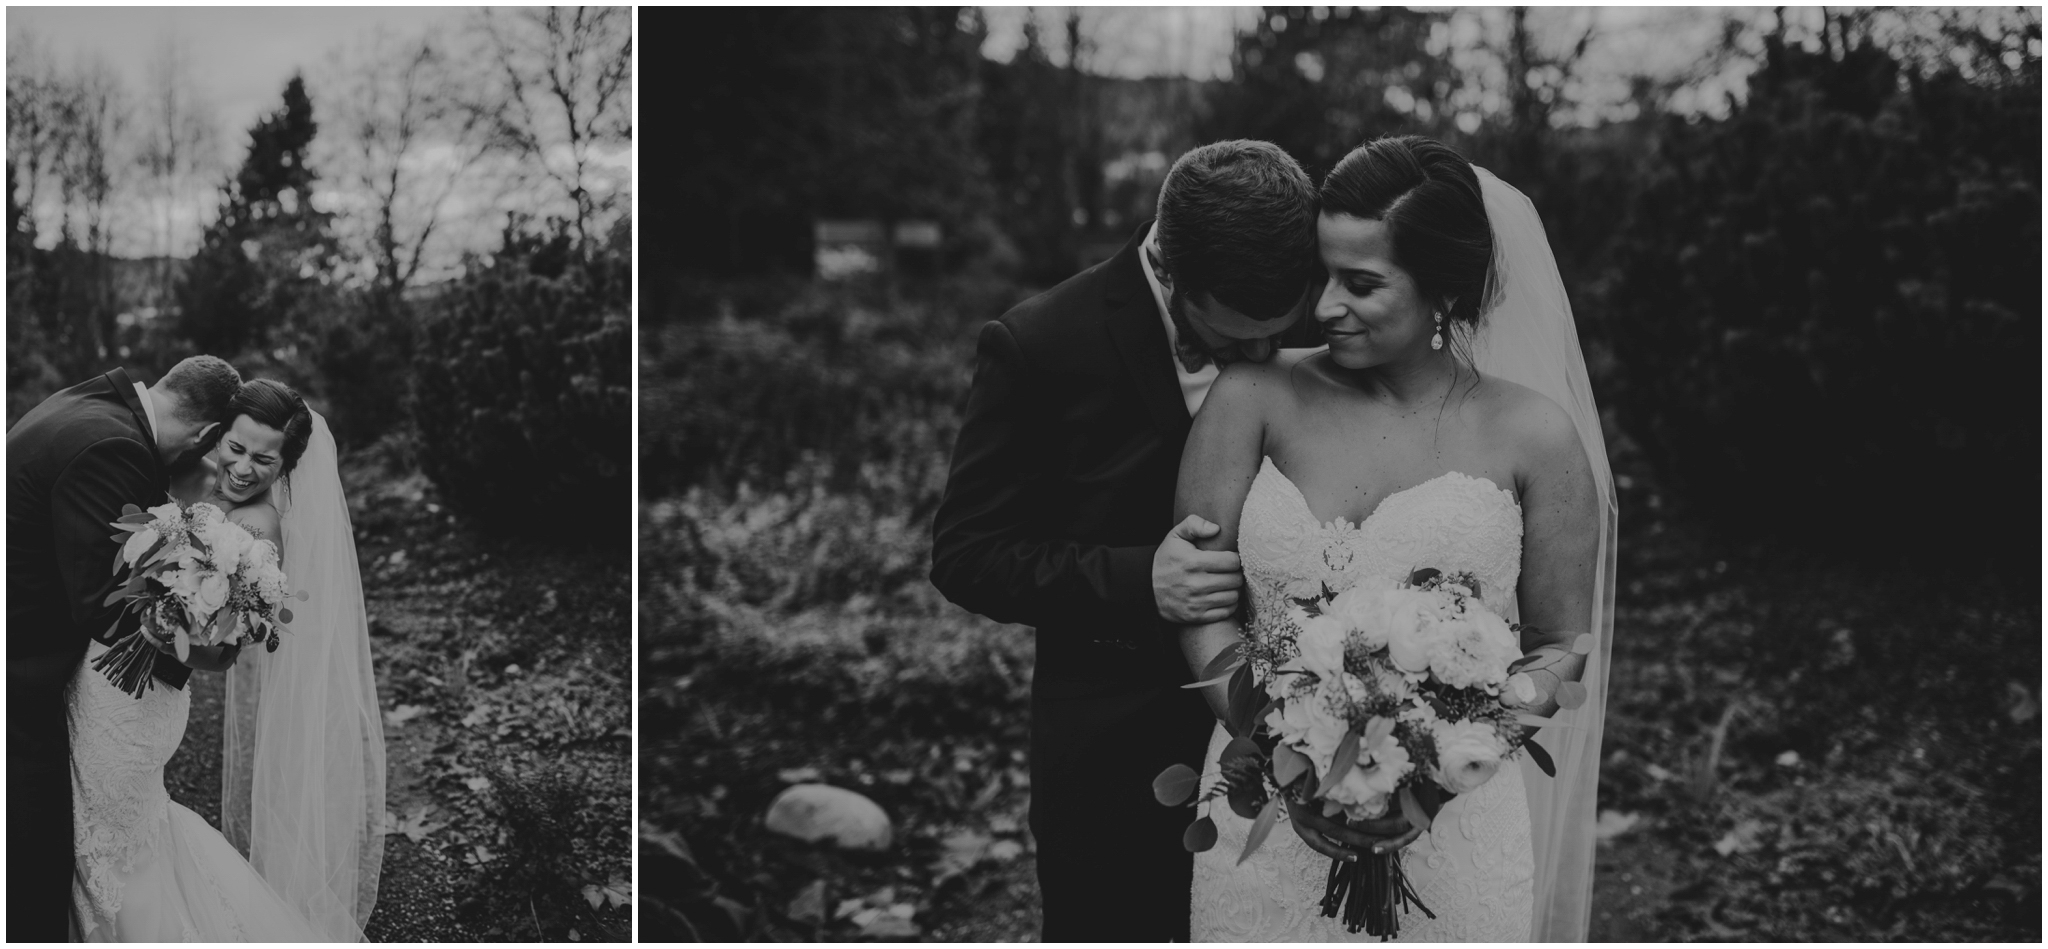 ashley-tj-the-pickering-barn-winter-wedding-seattle-photographer-045.jpg